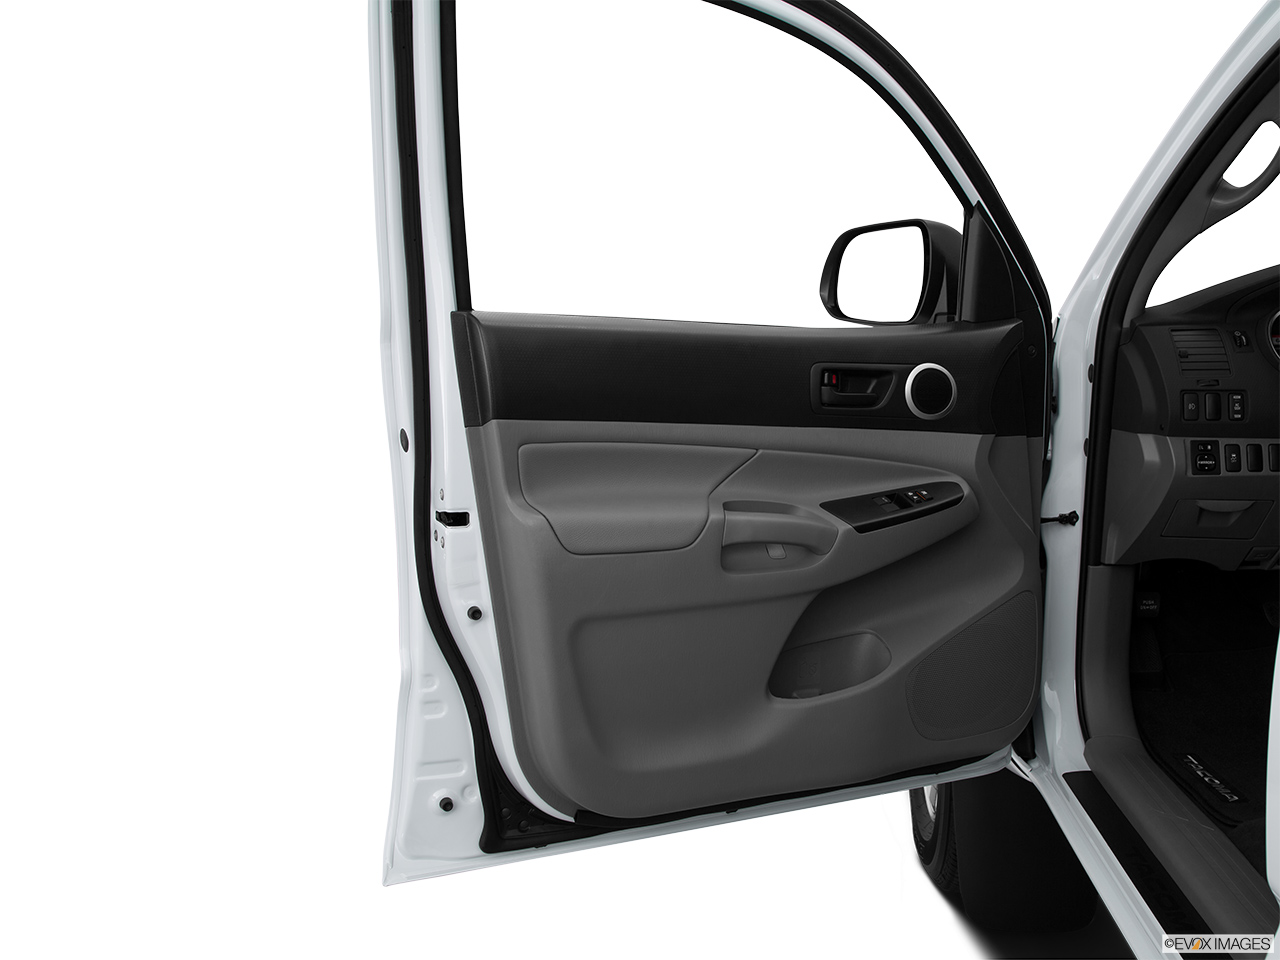 2015 Toyota Tacoma 2WD Access Cab I4 MT - Inside of driver ...